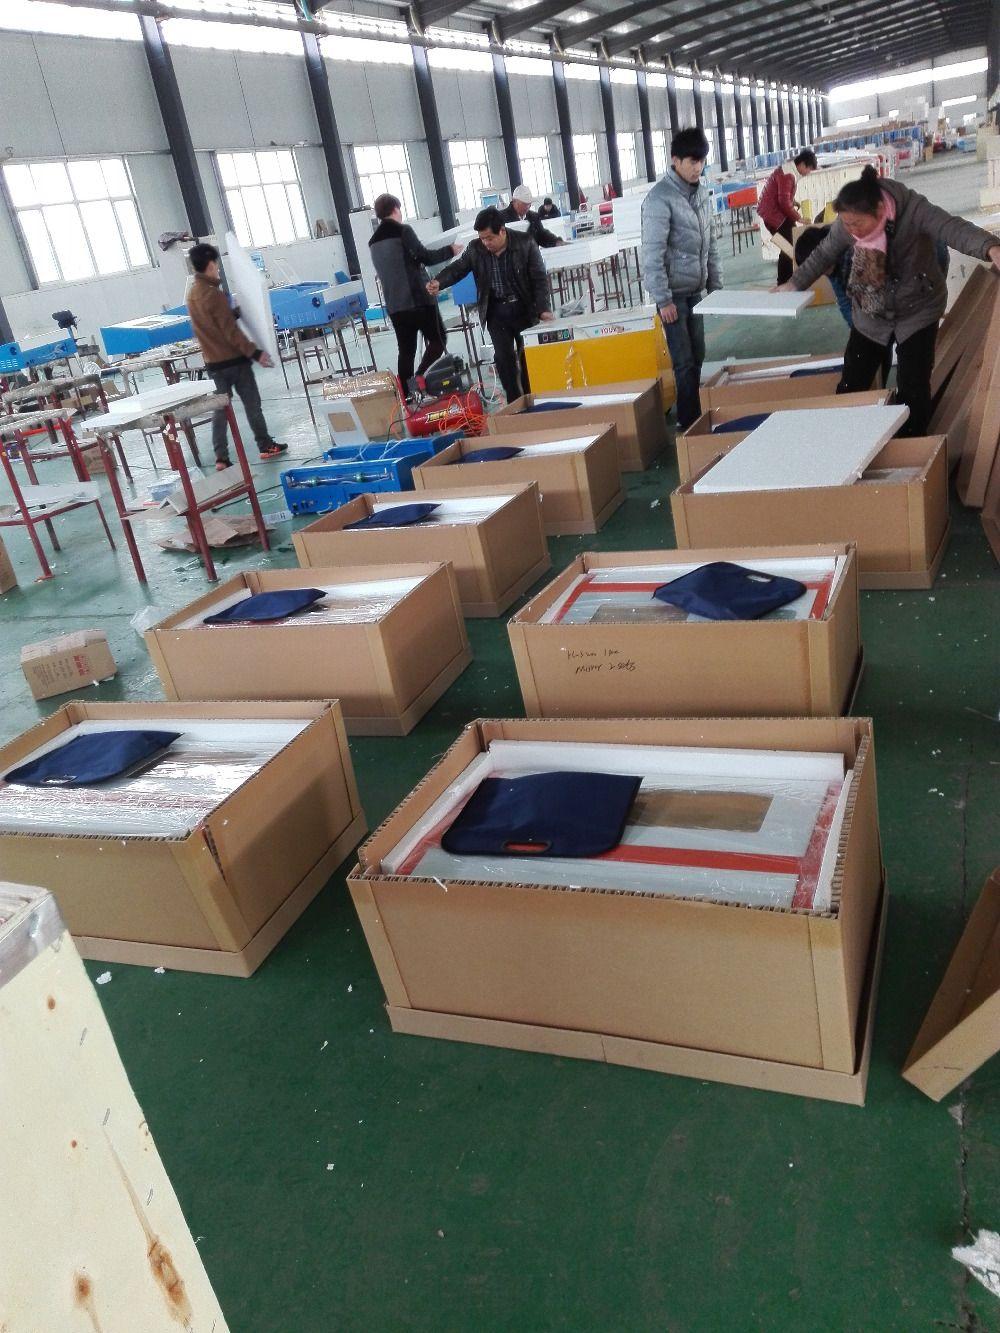 K40 300x200mm CO2 النقش بالليزر آلة قطع حفارة النجارة / الحرف الصين مصنع رخيصة الثمن